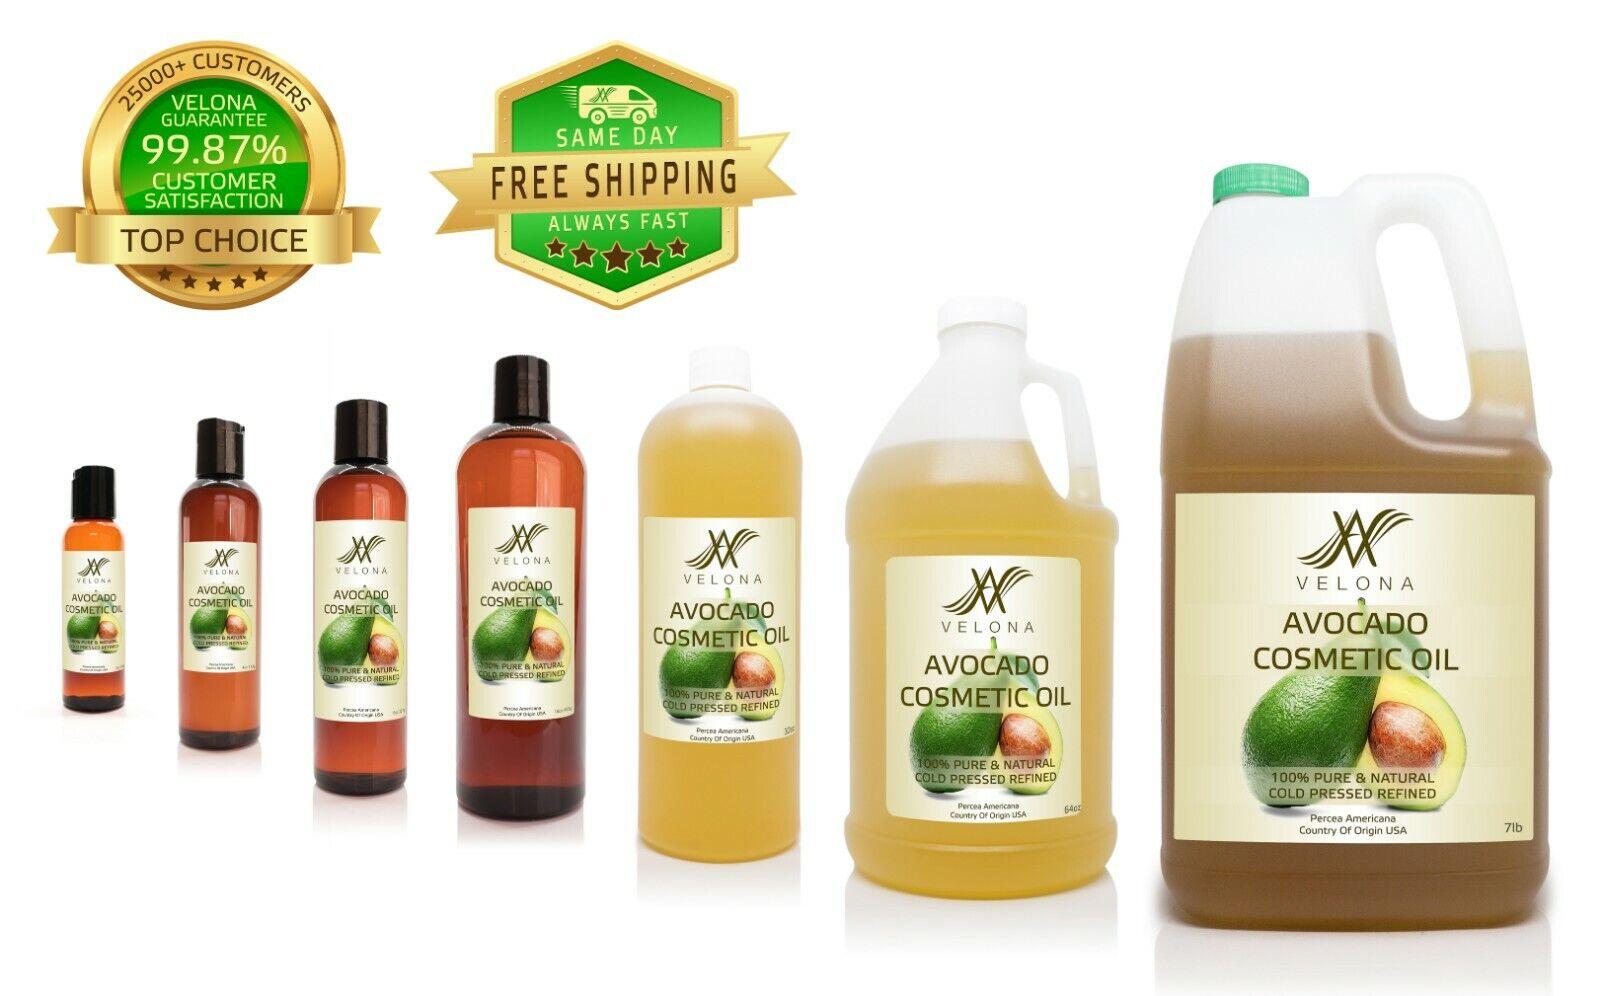 Avocado Cosmetic Oil 2oz-7lb REFINED NATURAL NATURAL Cold Pressed  PURE VELONA Health & Beauty